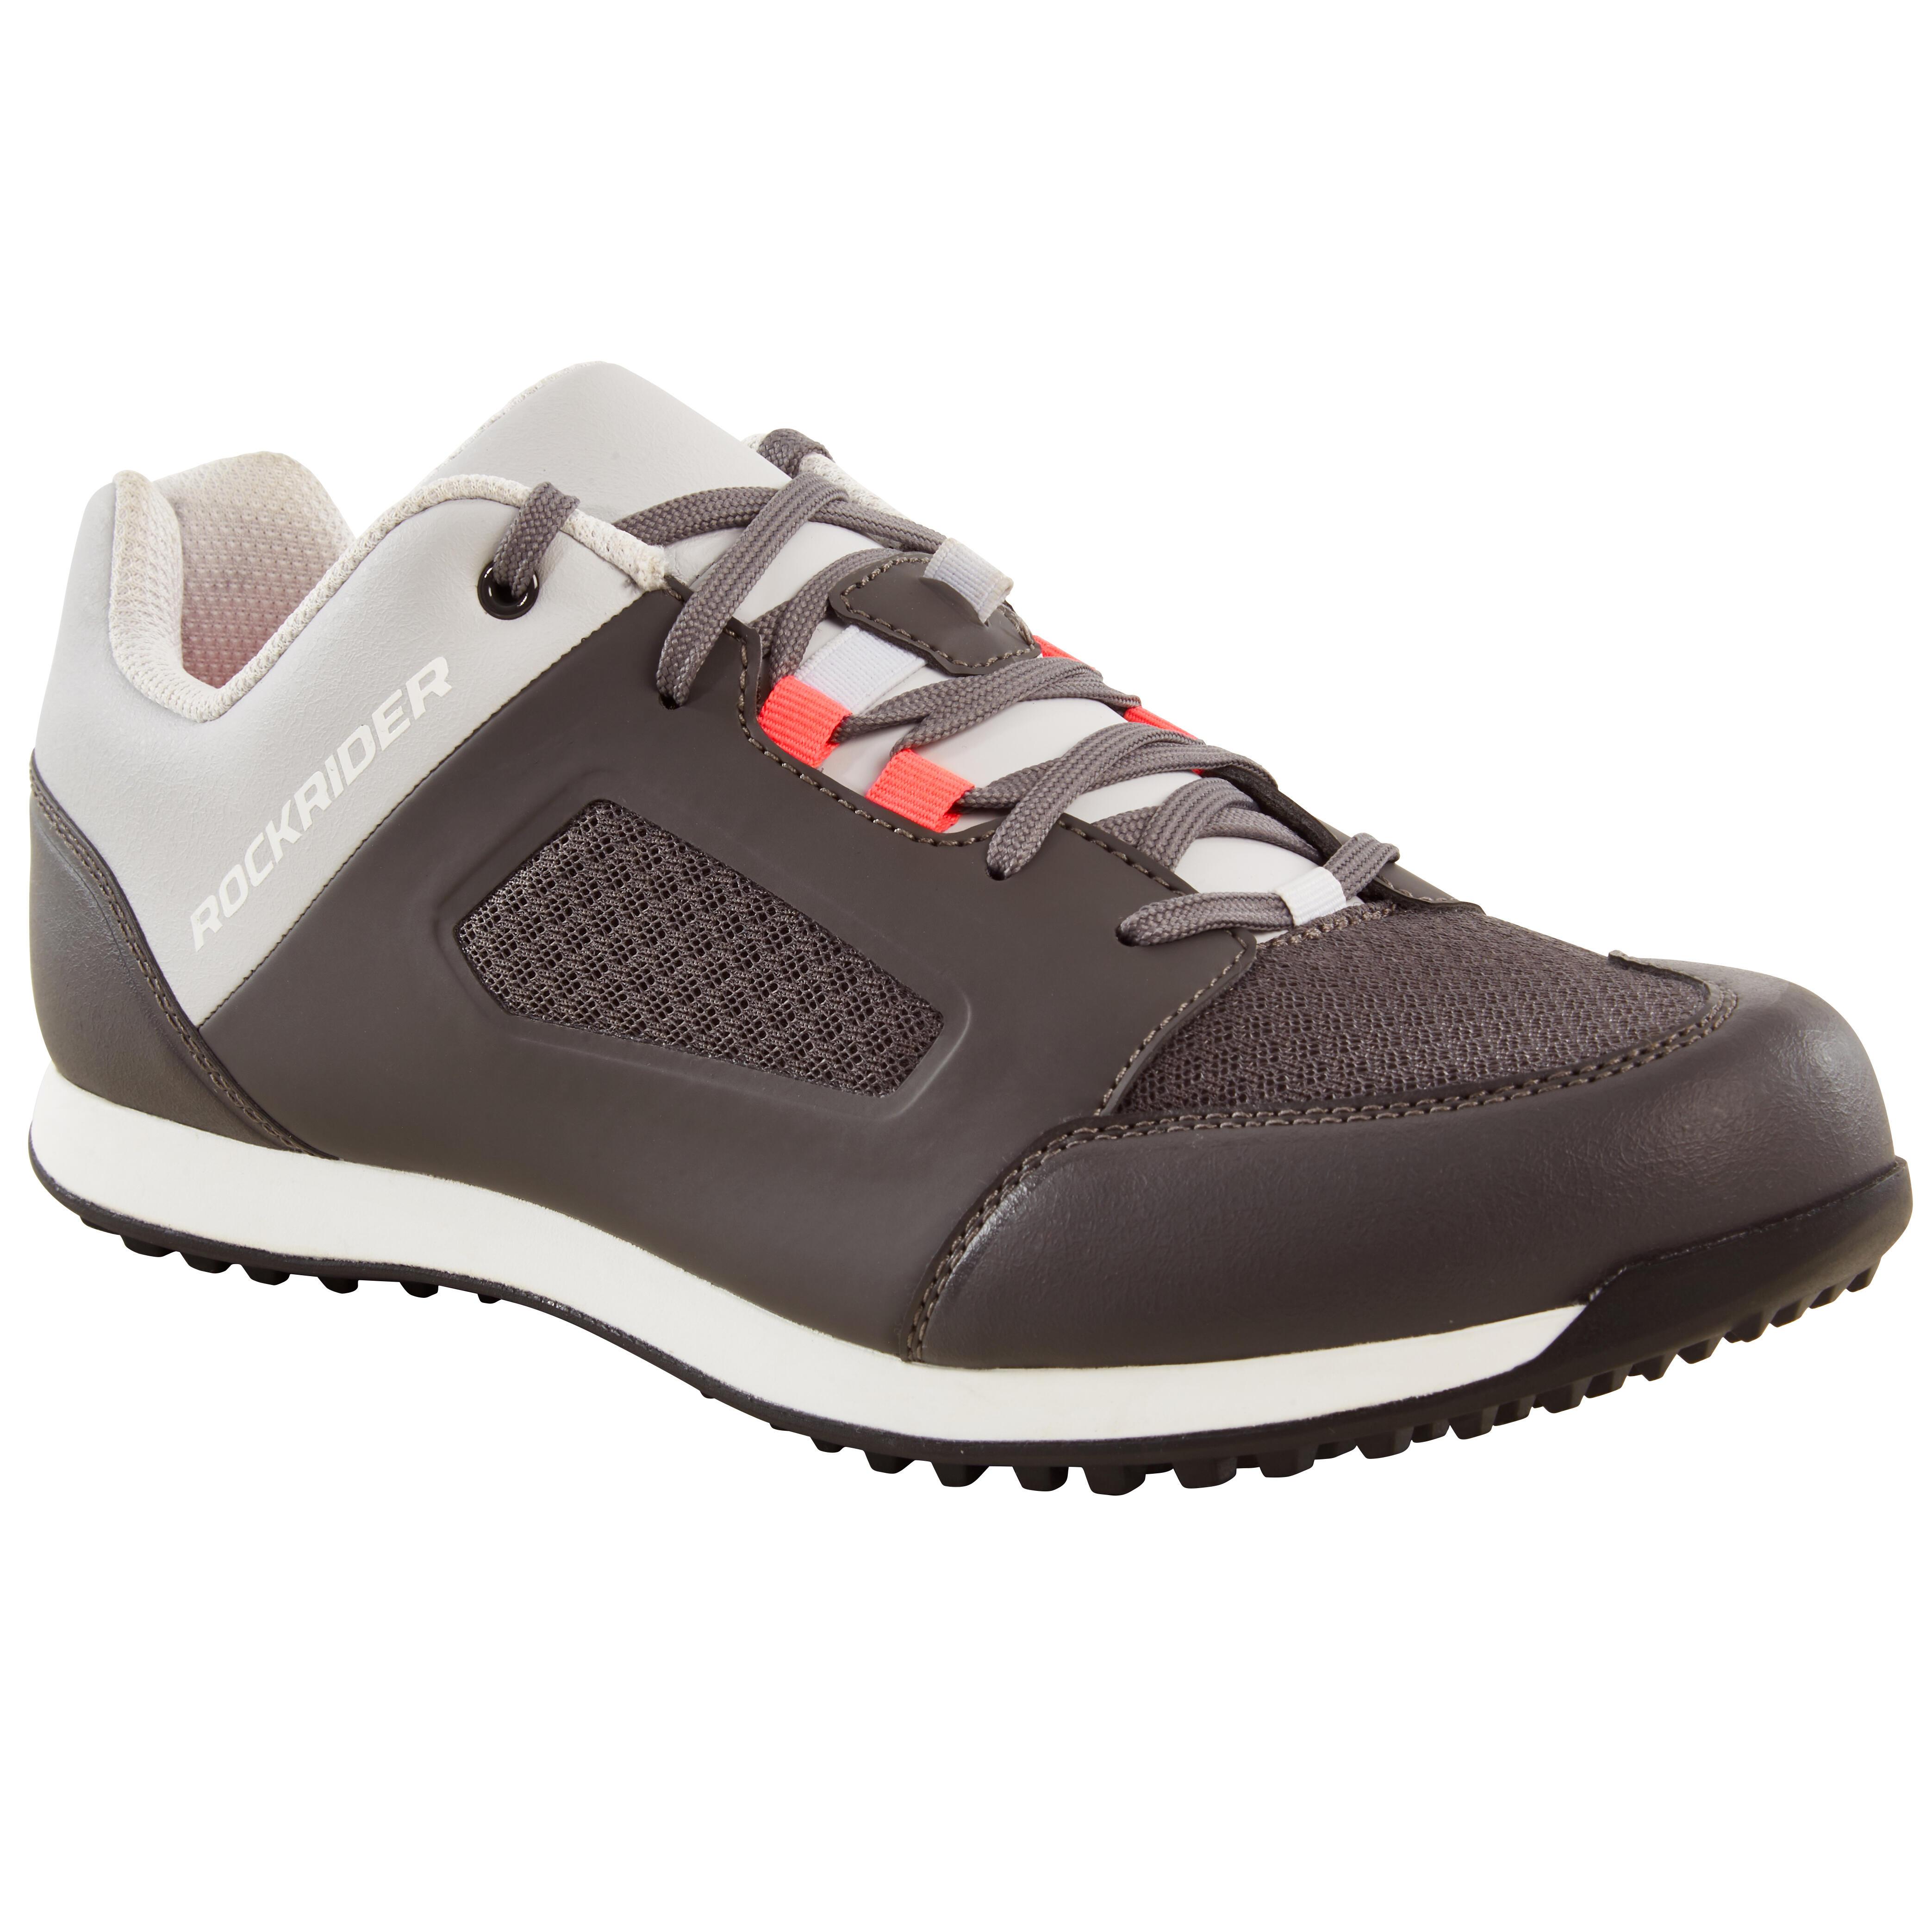 Rockrider MTB-schoenen ST 100 grijs dames